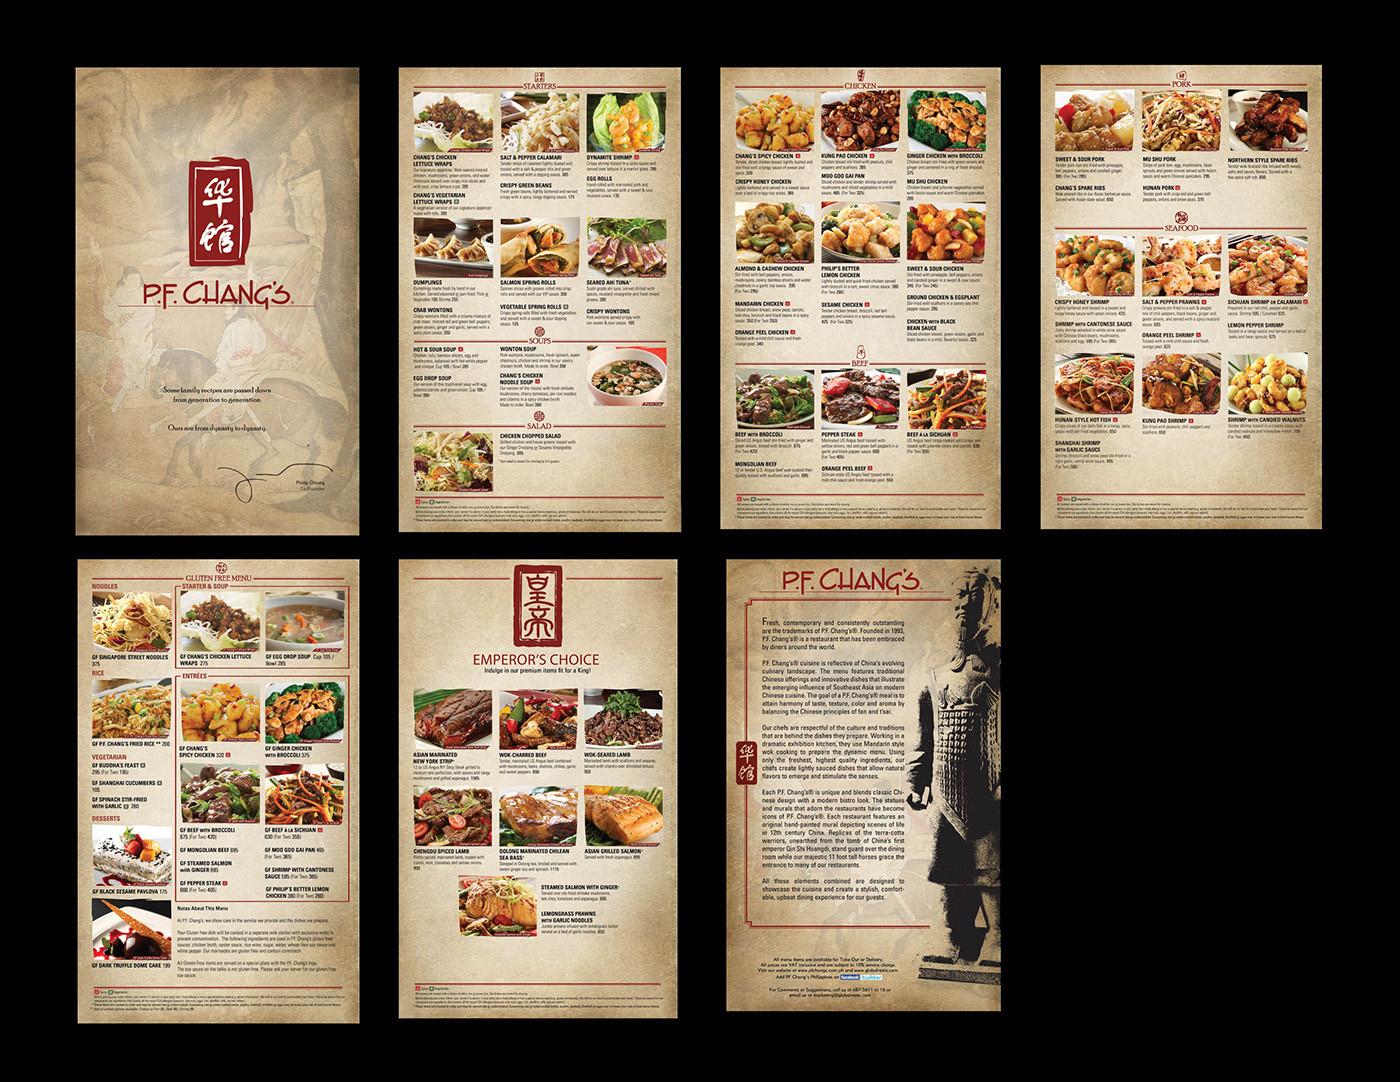 Pf Changs Dessert Menu  Pf Changs Menu Nutritional Value Nutrition Ftempo